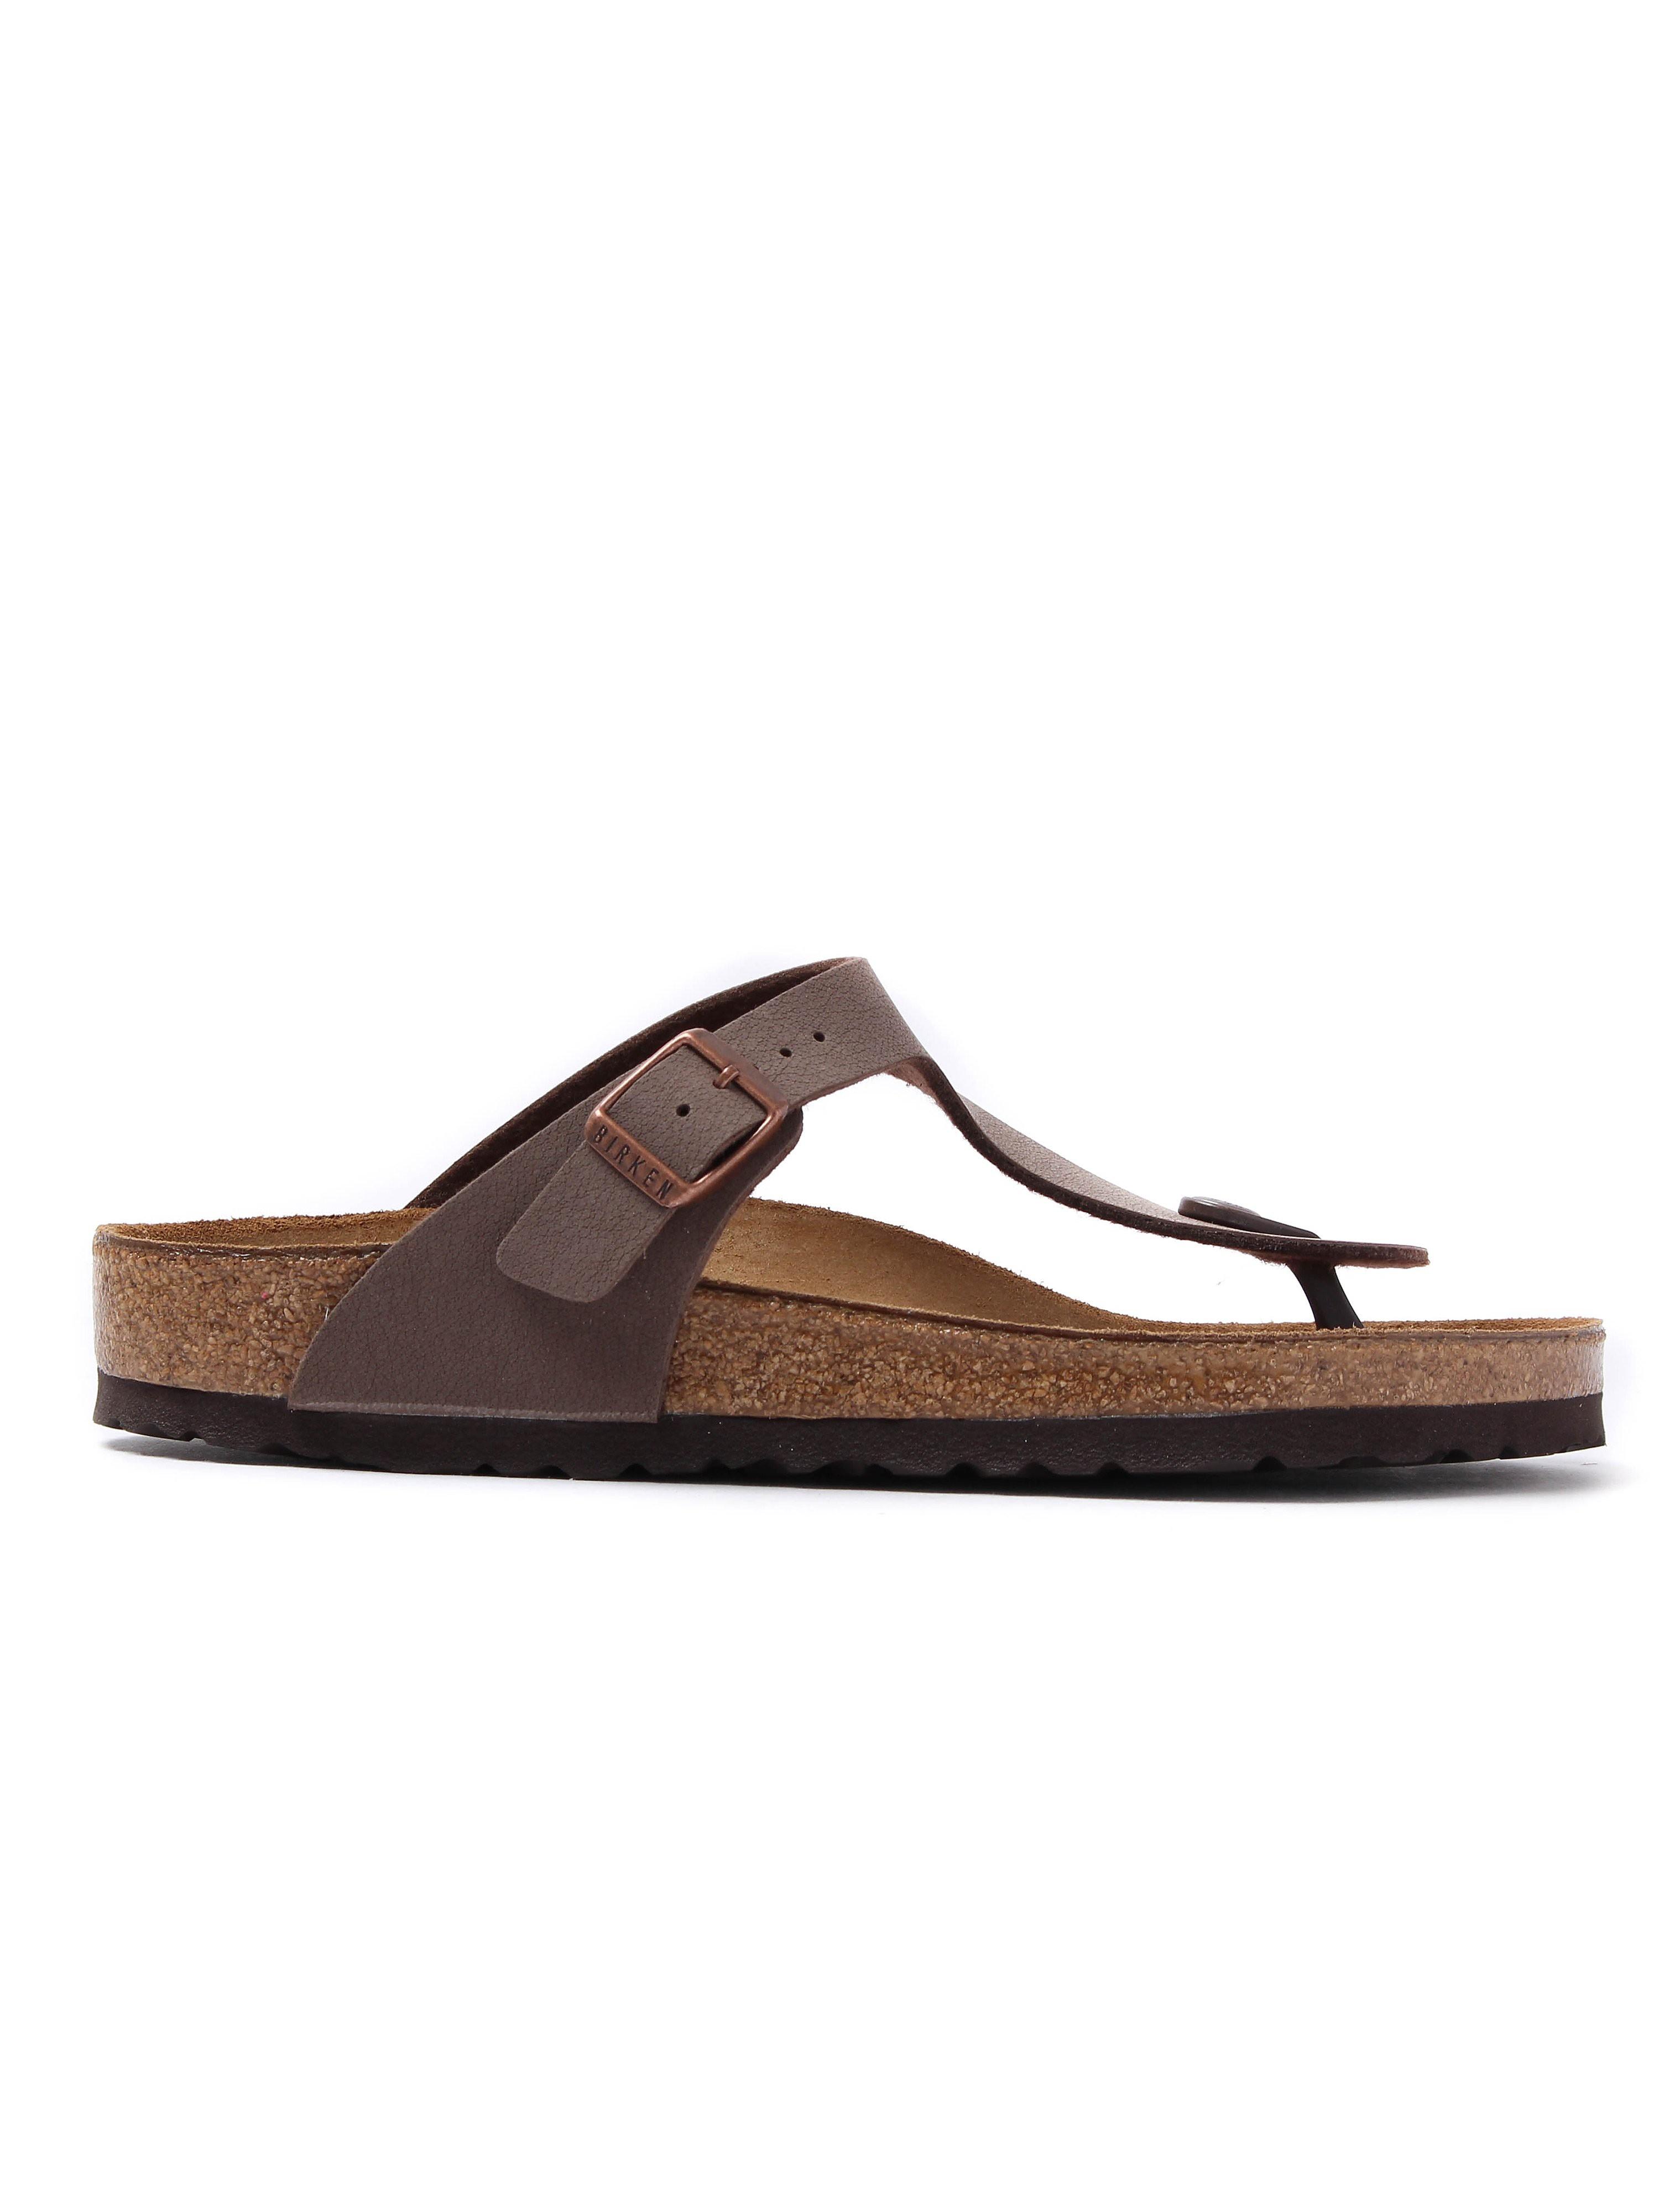 Birkenstock Women's Gizeh Toe Strap Birko-Flor Sandals - Mocca